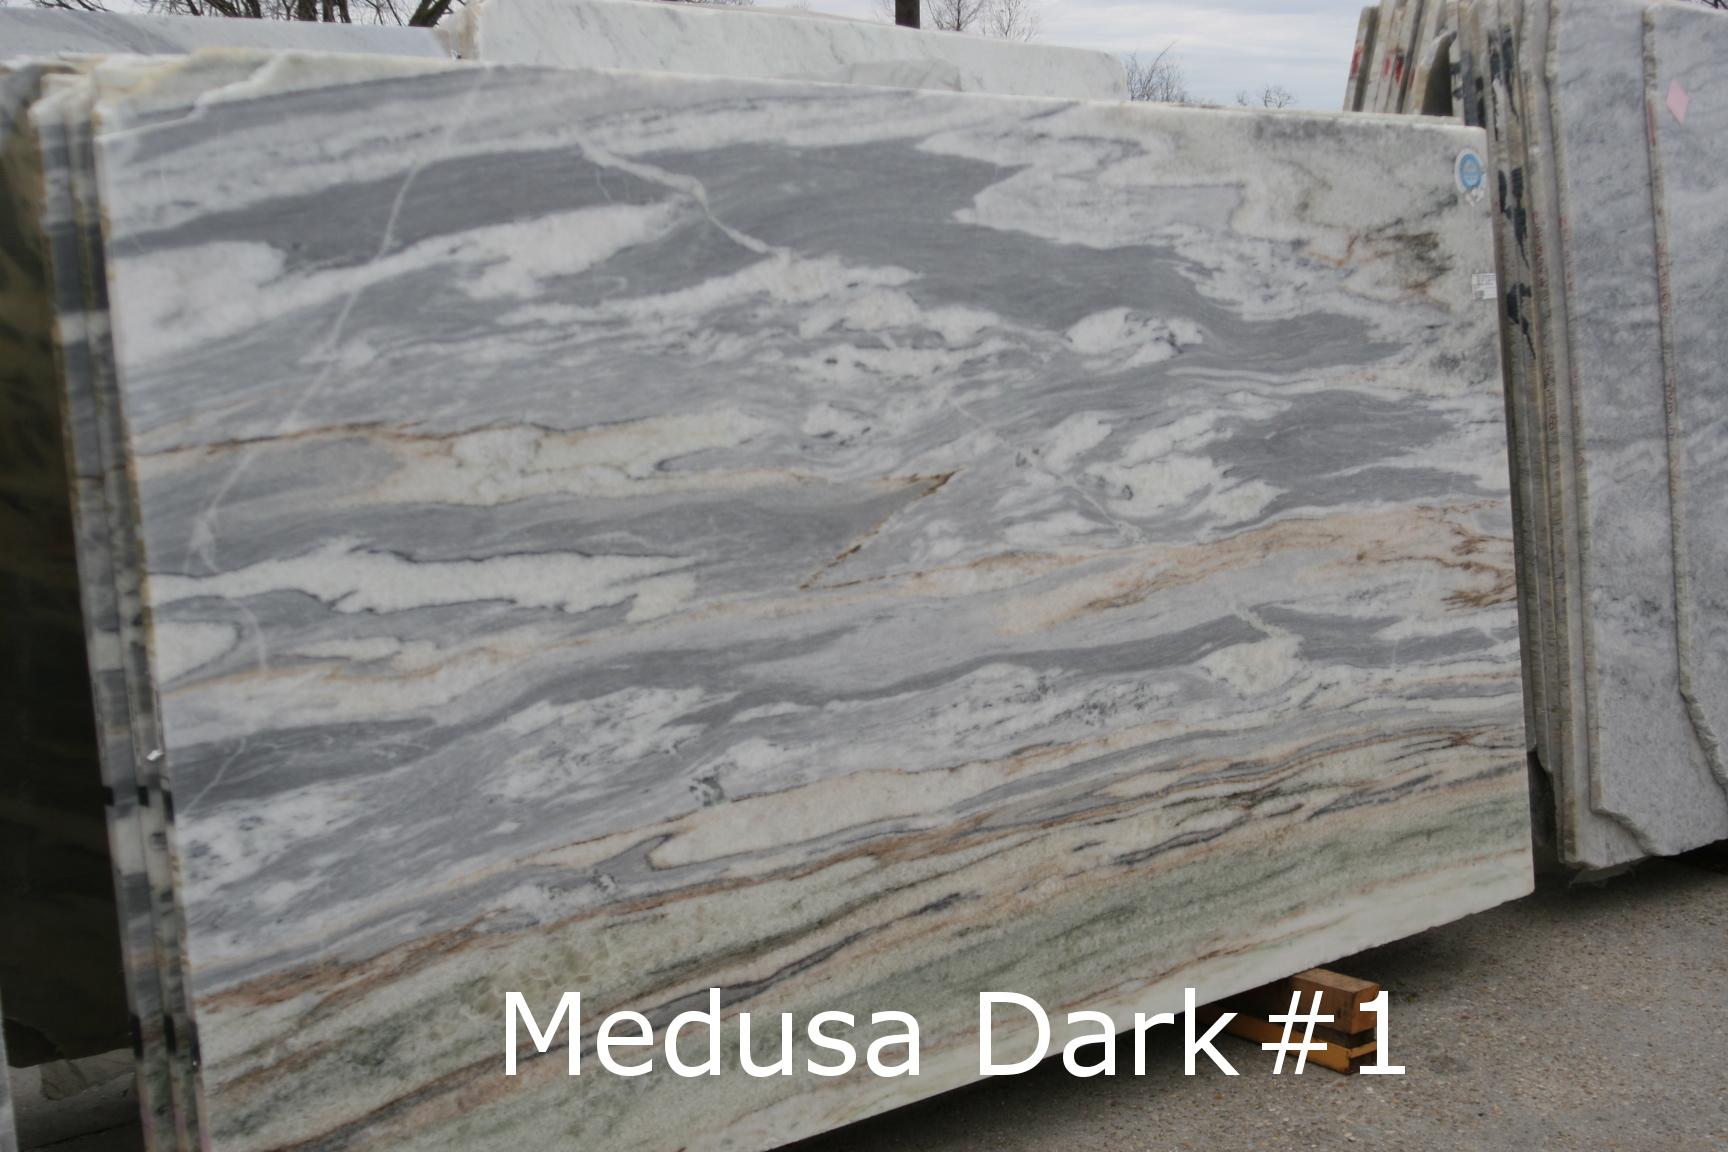 Medusa Dark #1